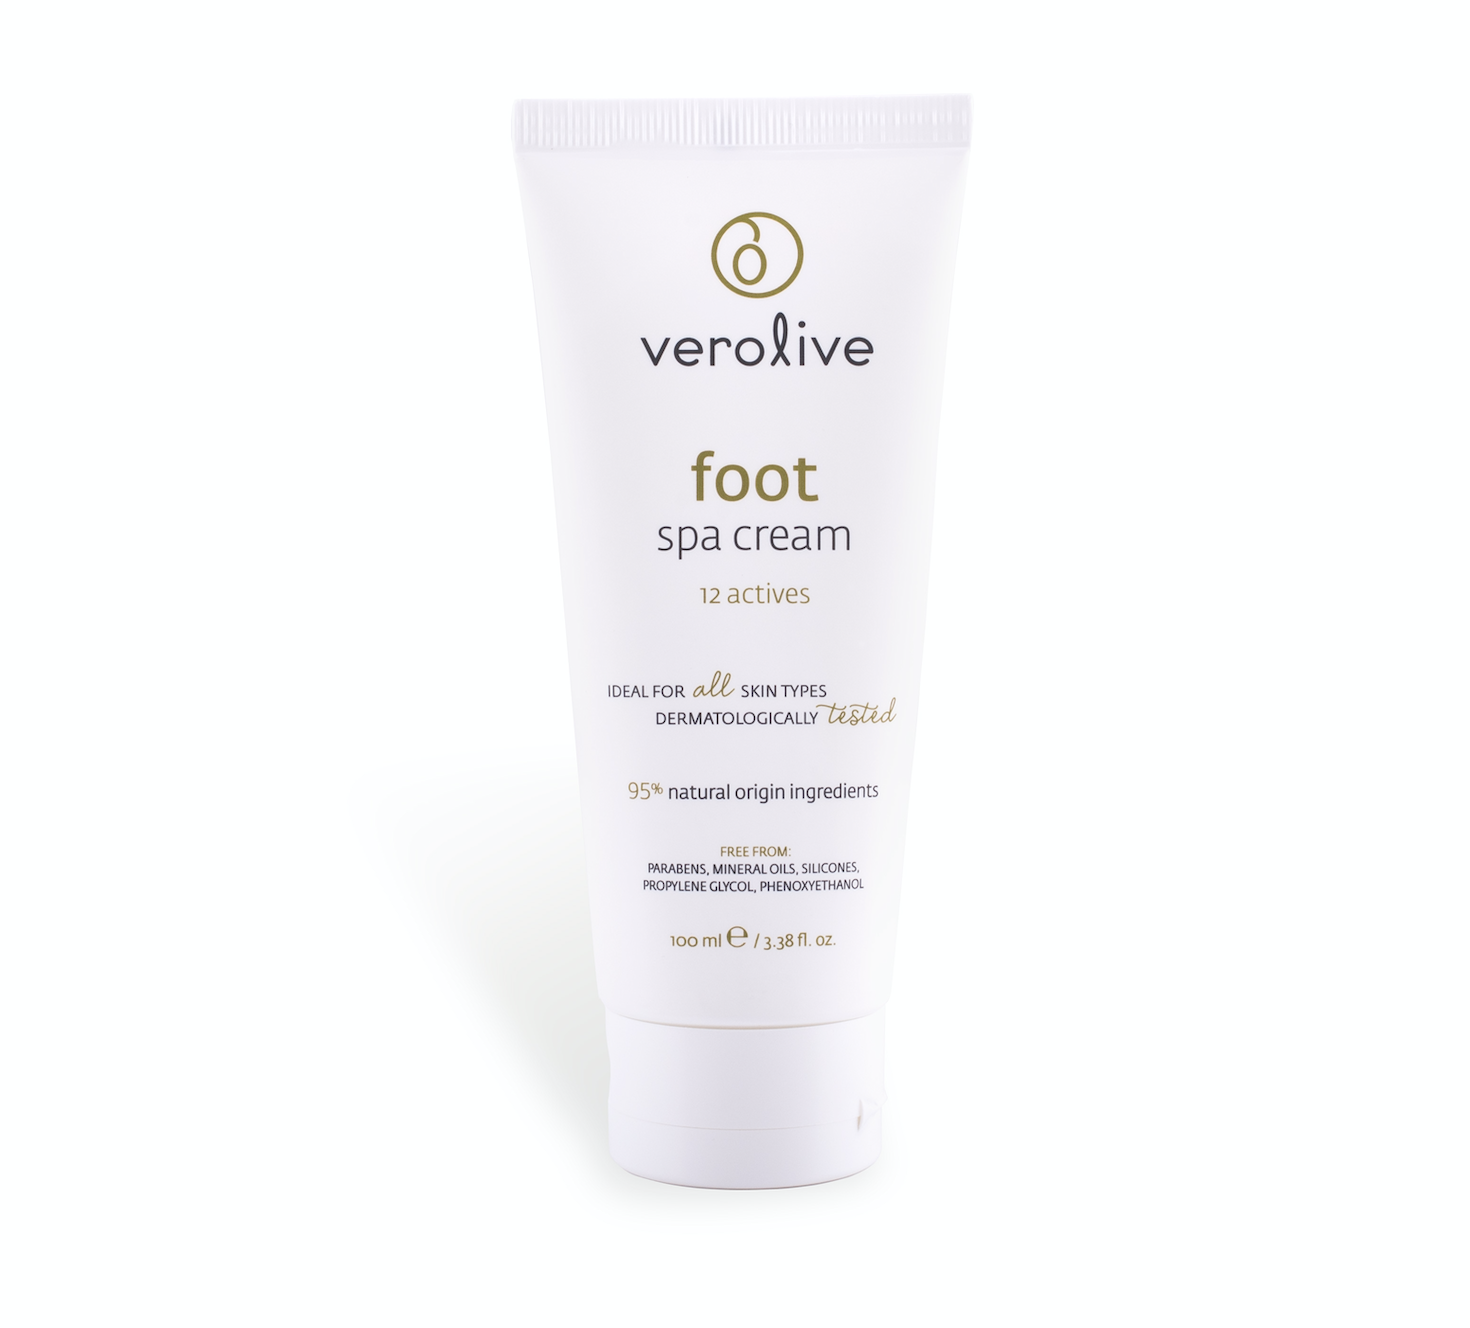 Foot spa cream